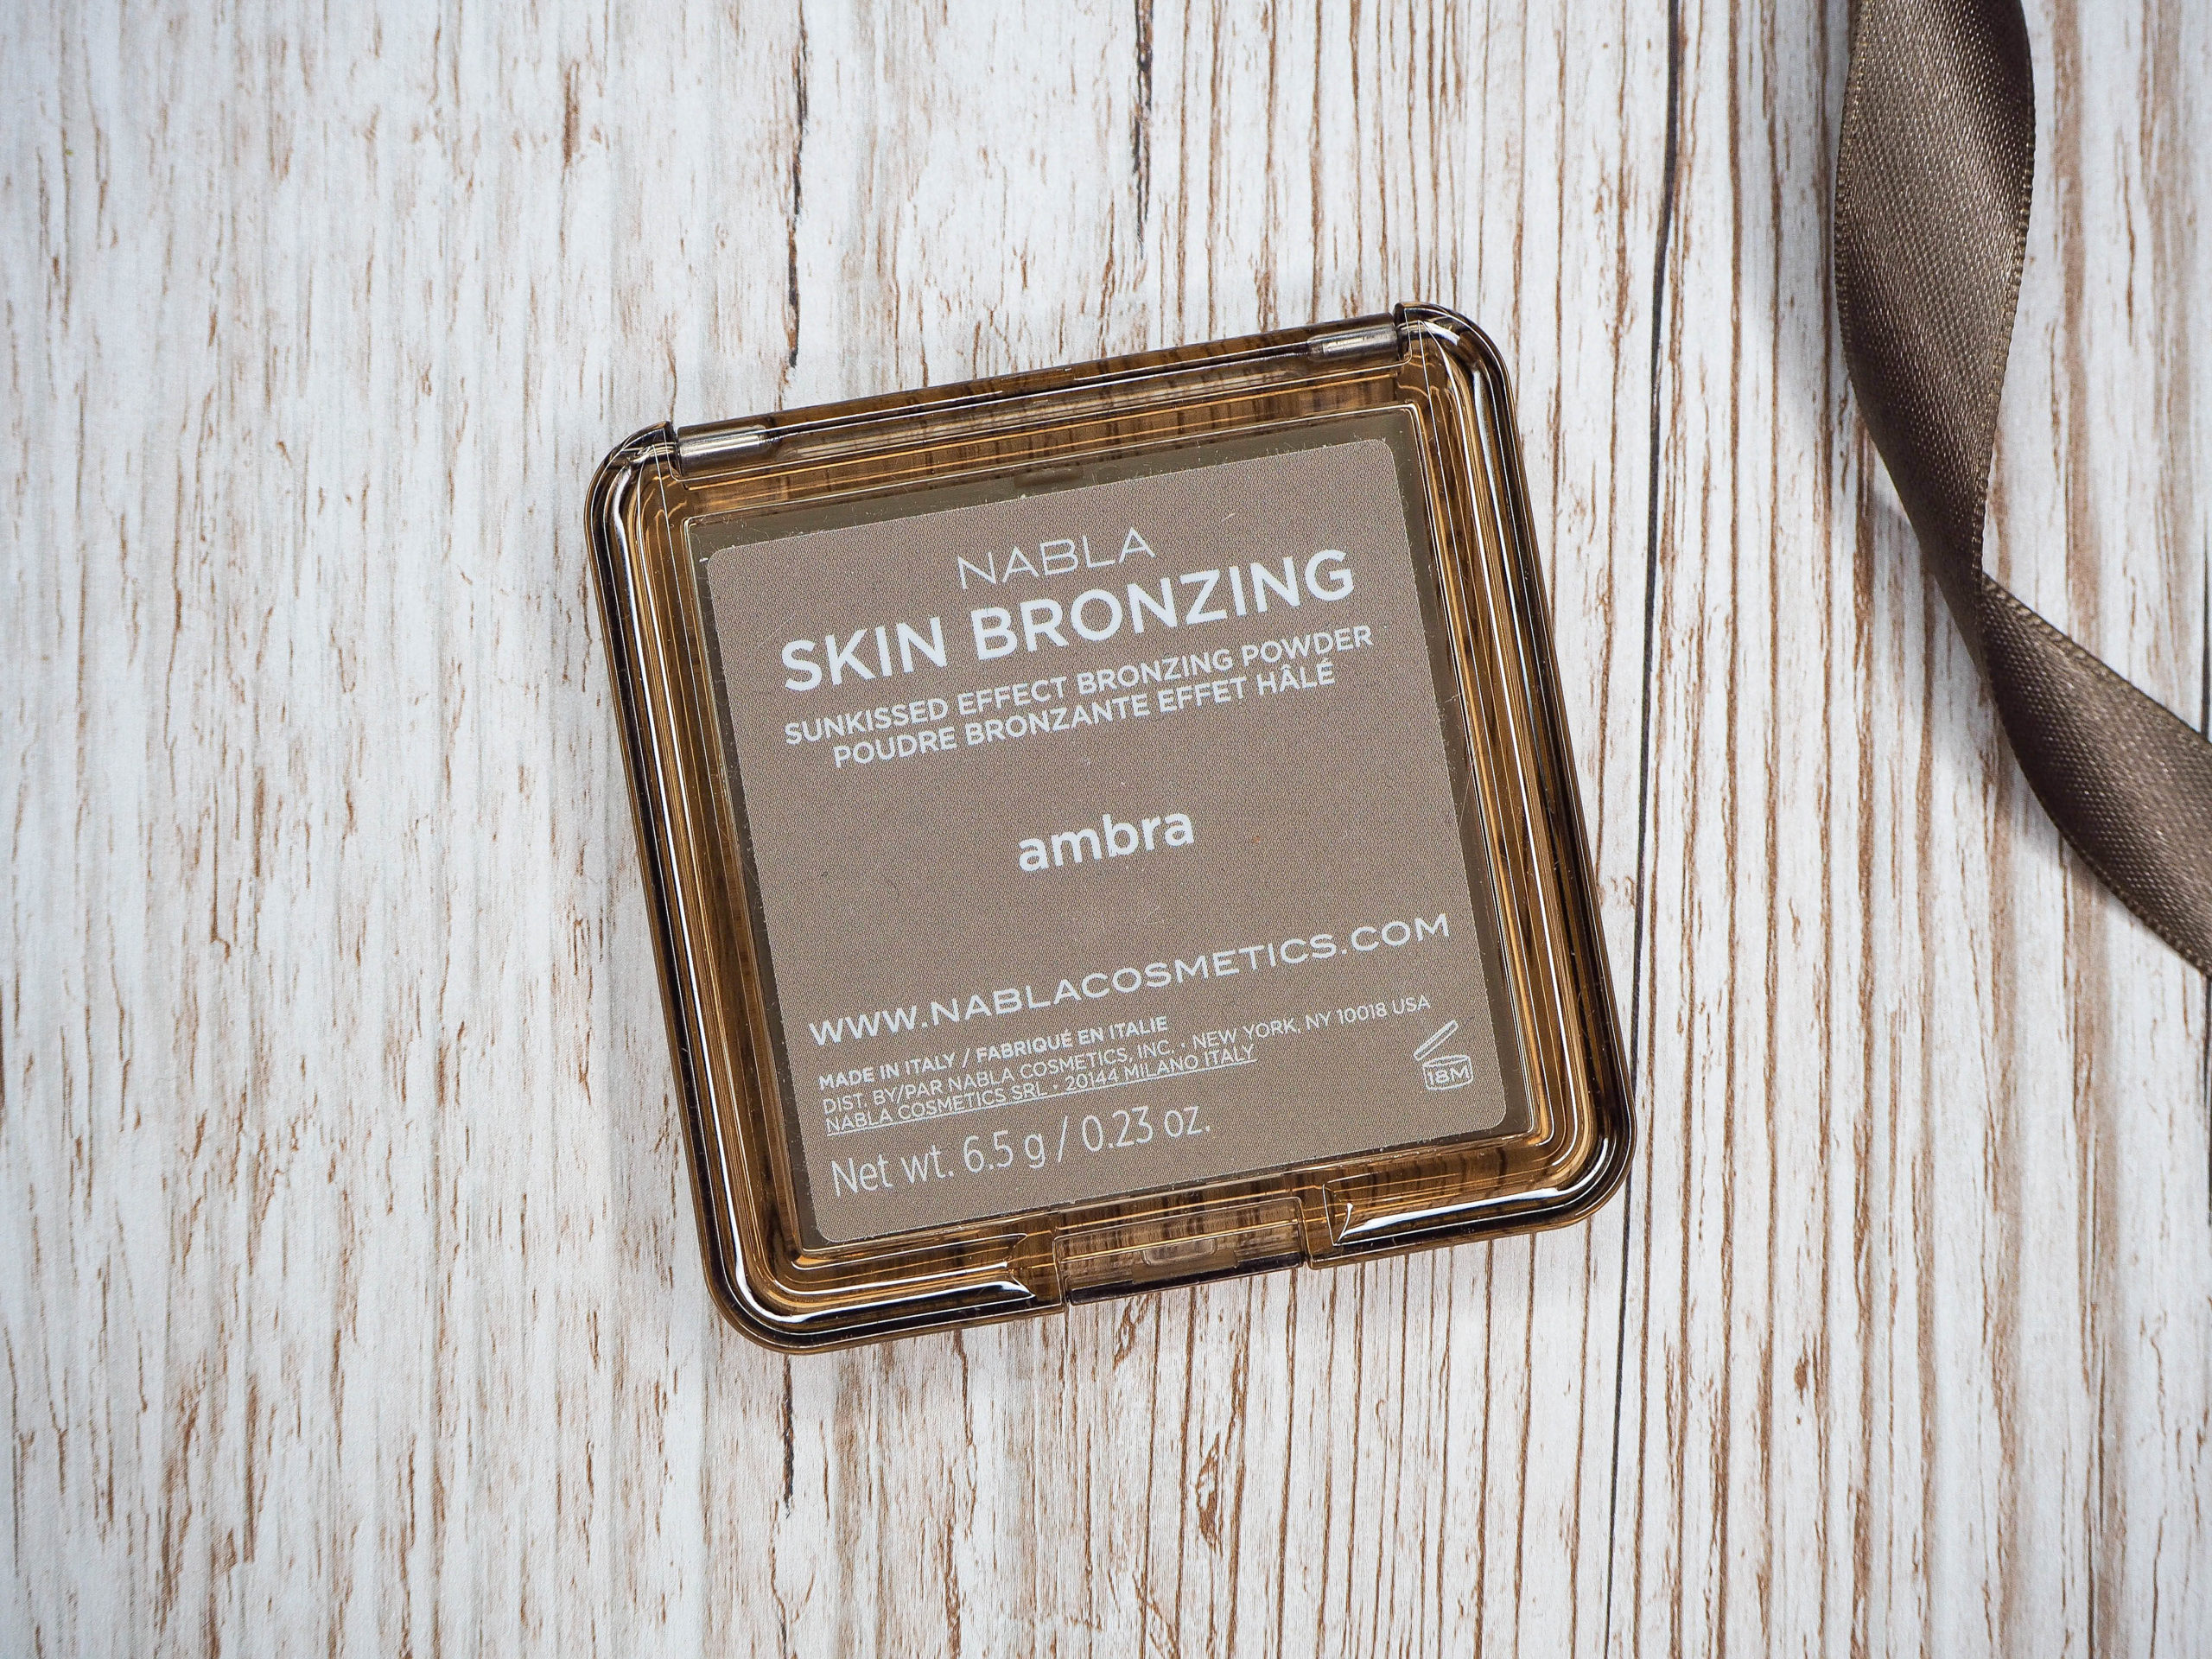 Nabla Skin Bronzing Ambra Bronzer